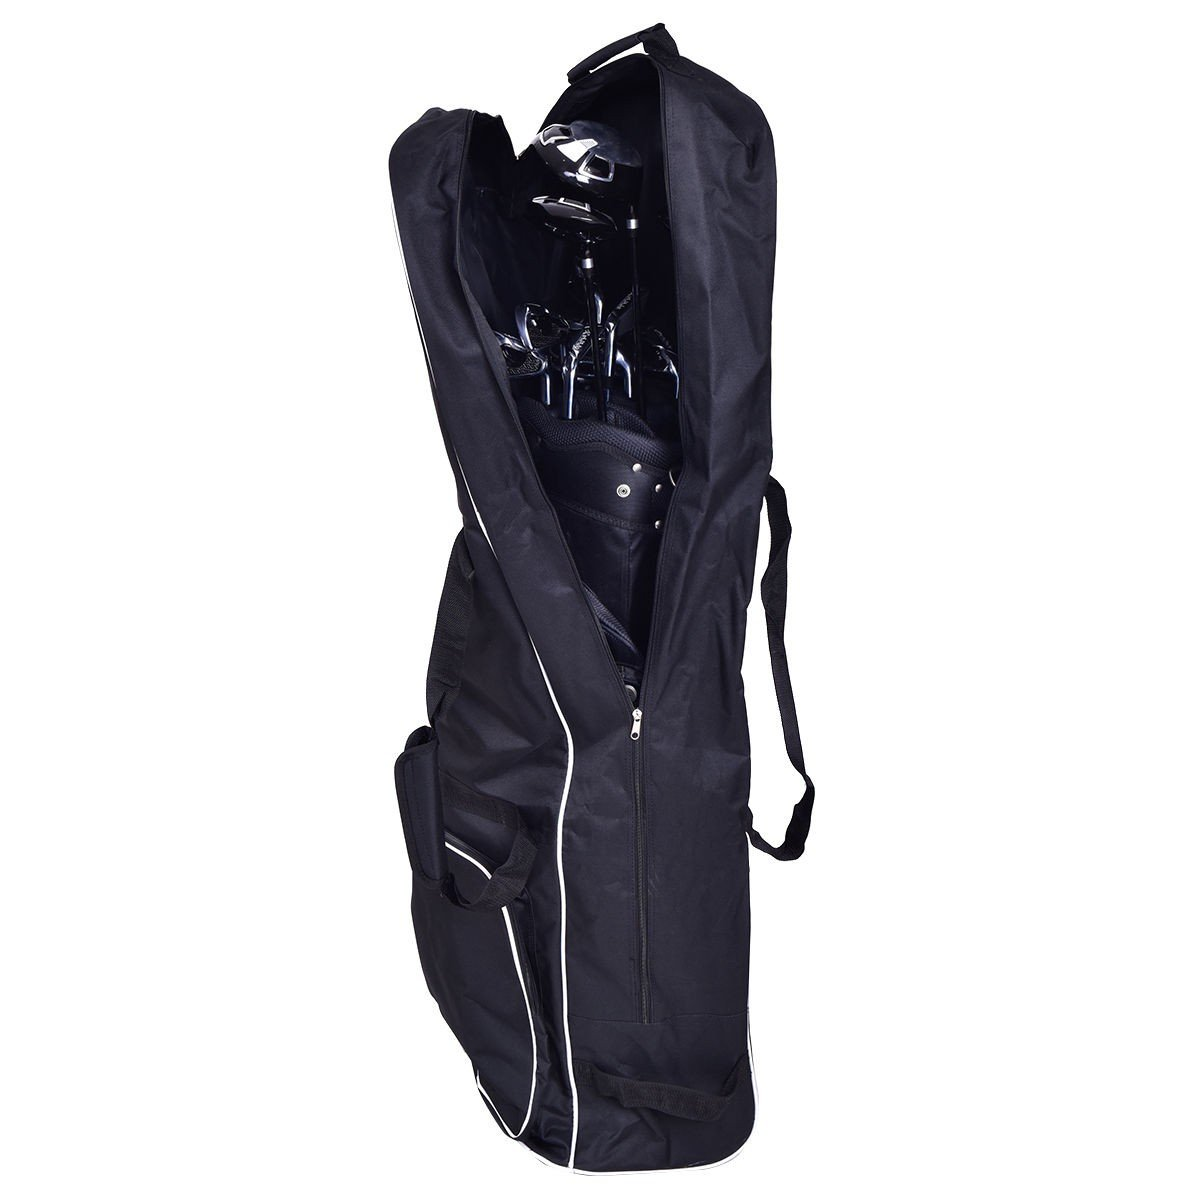 CHOOSEandBUY Black Foldable Golf Bag Travel Cover with Wheel